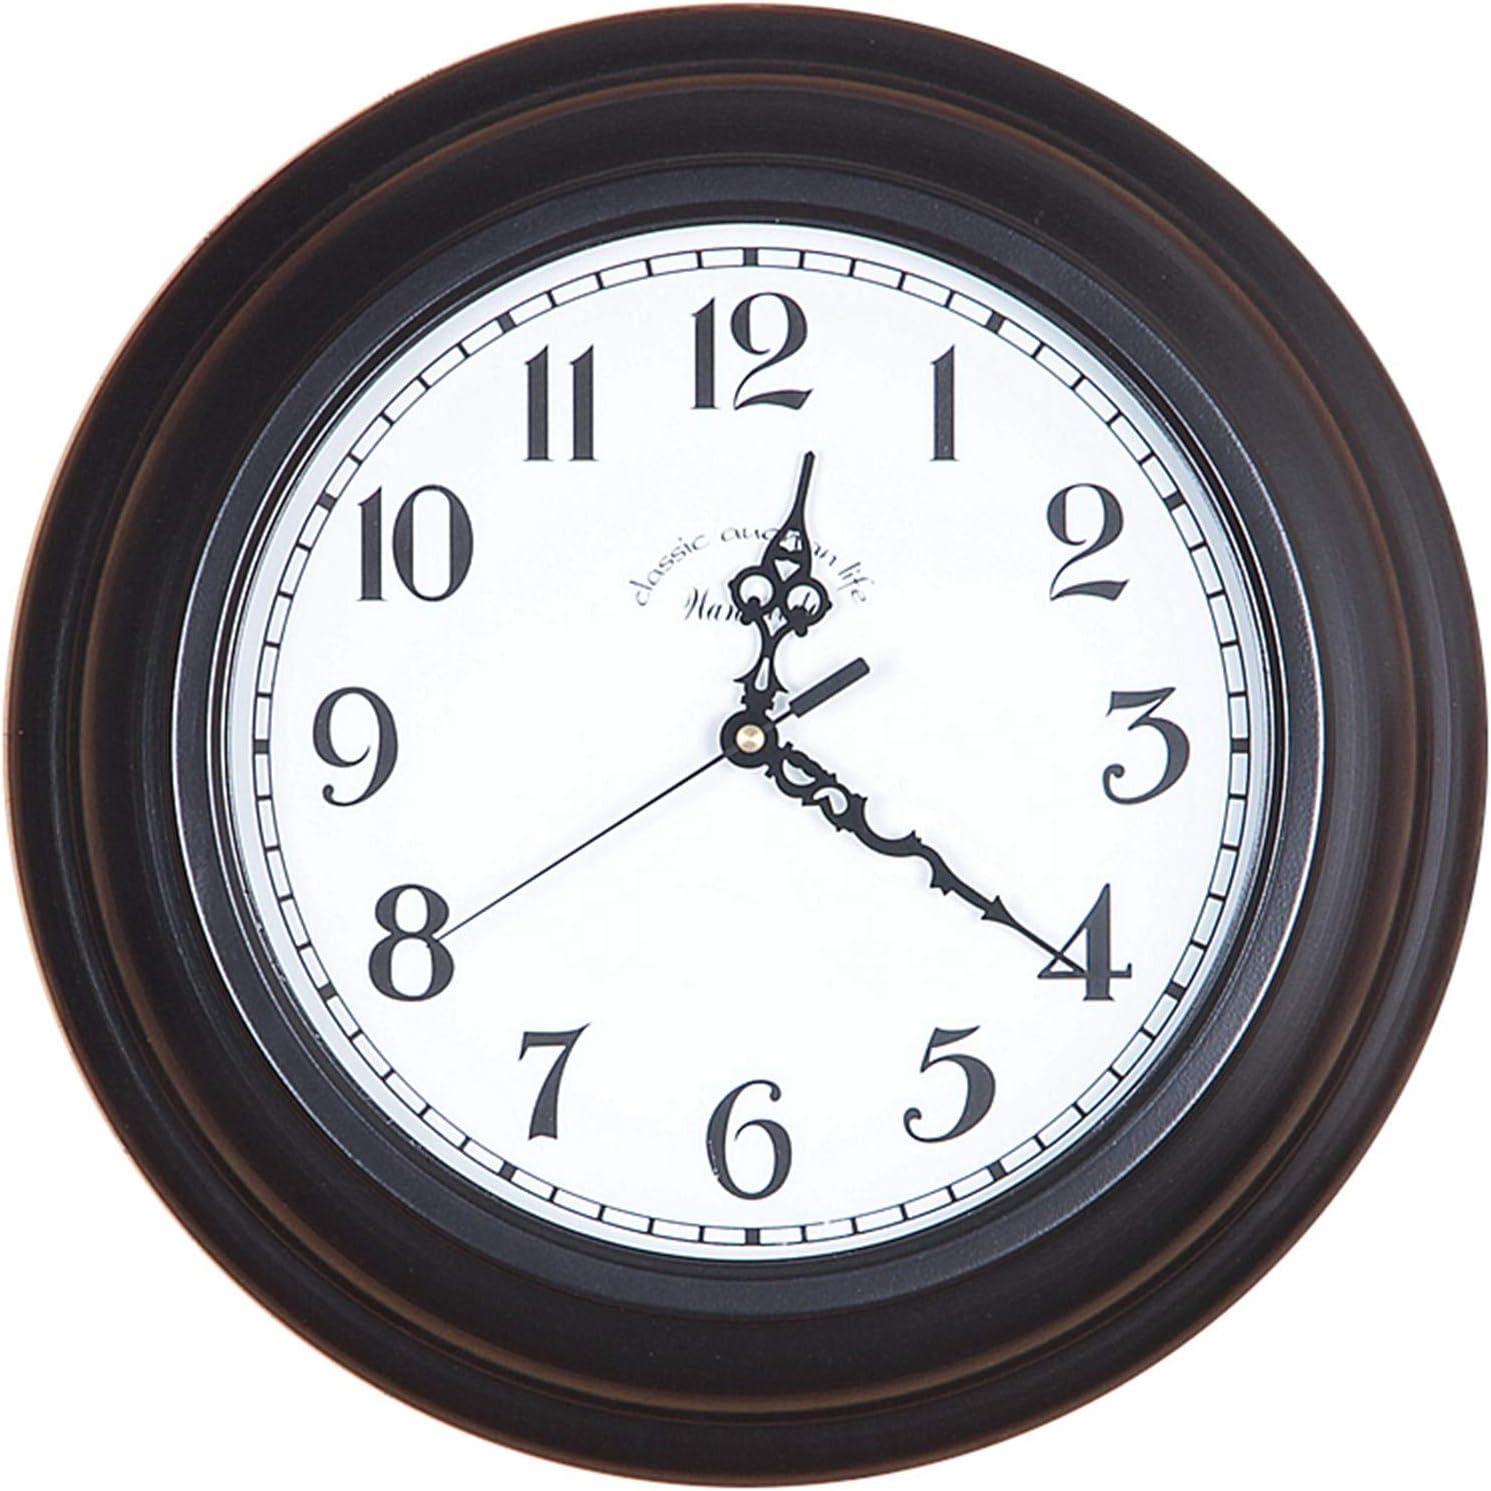 Max 51% OFF Wall Clock Silent Non-Ticking Battery Clocks Hanging Decorative Finally resale start